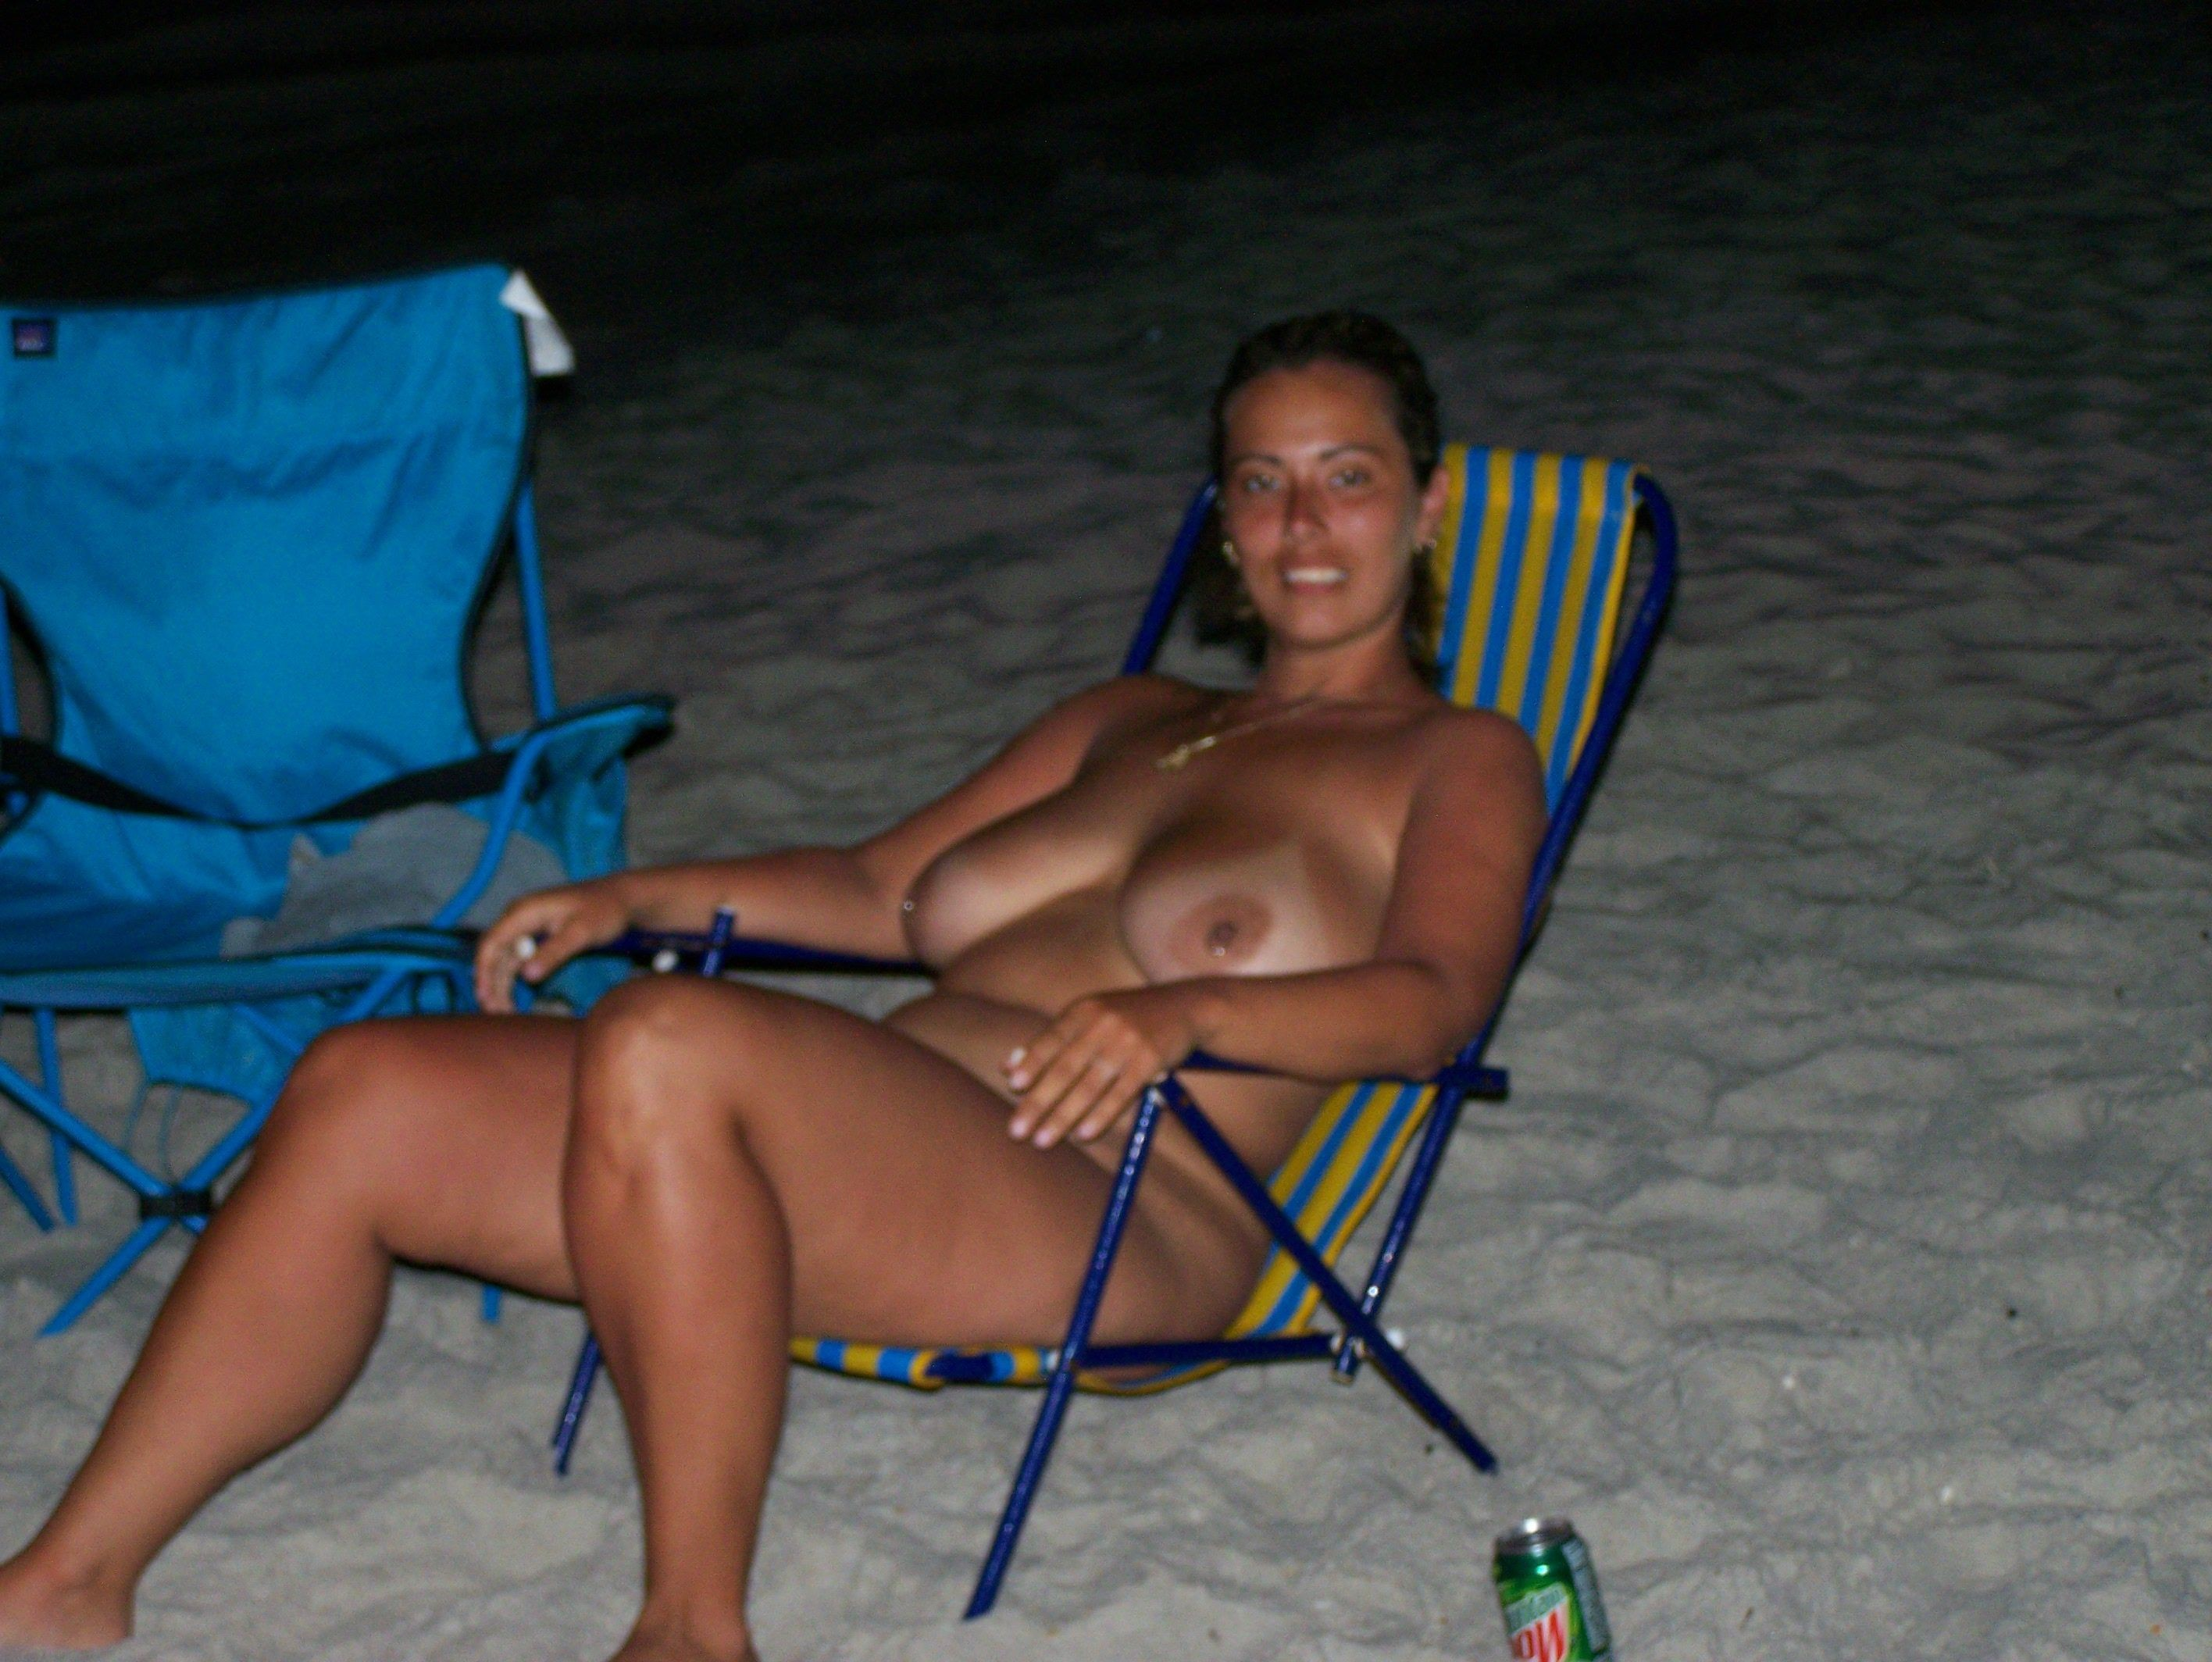 Nudist voluptuous hottie enjoying a mountain dew